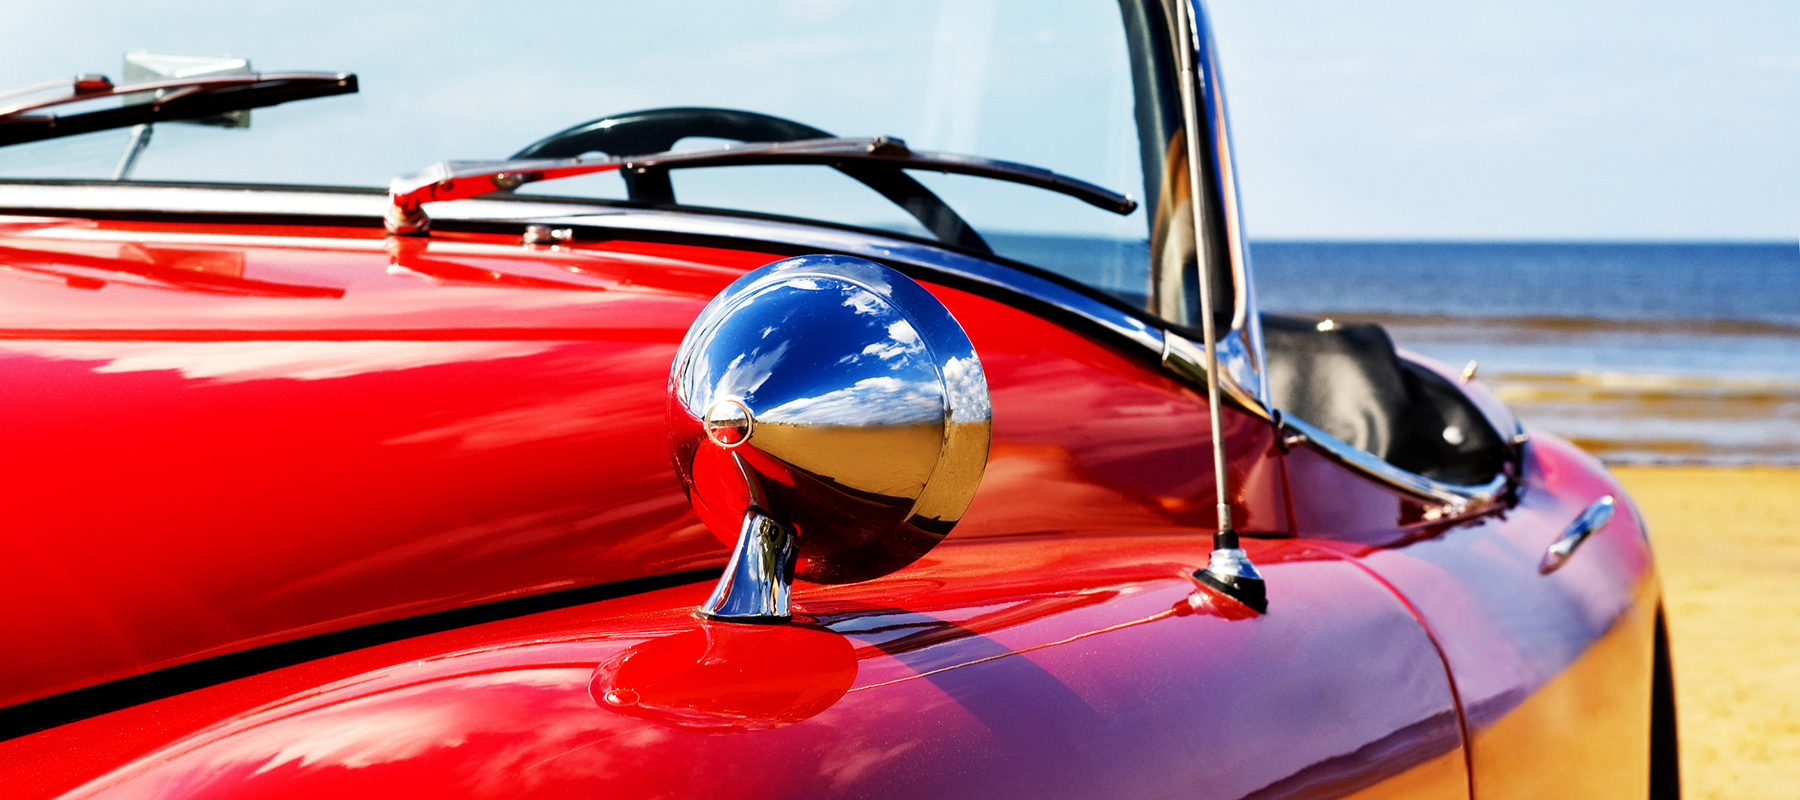 D.F. Dwyer Auto Insurance